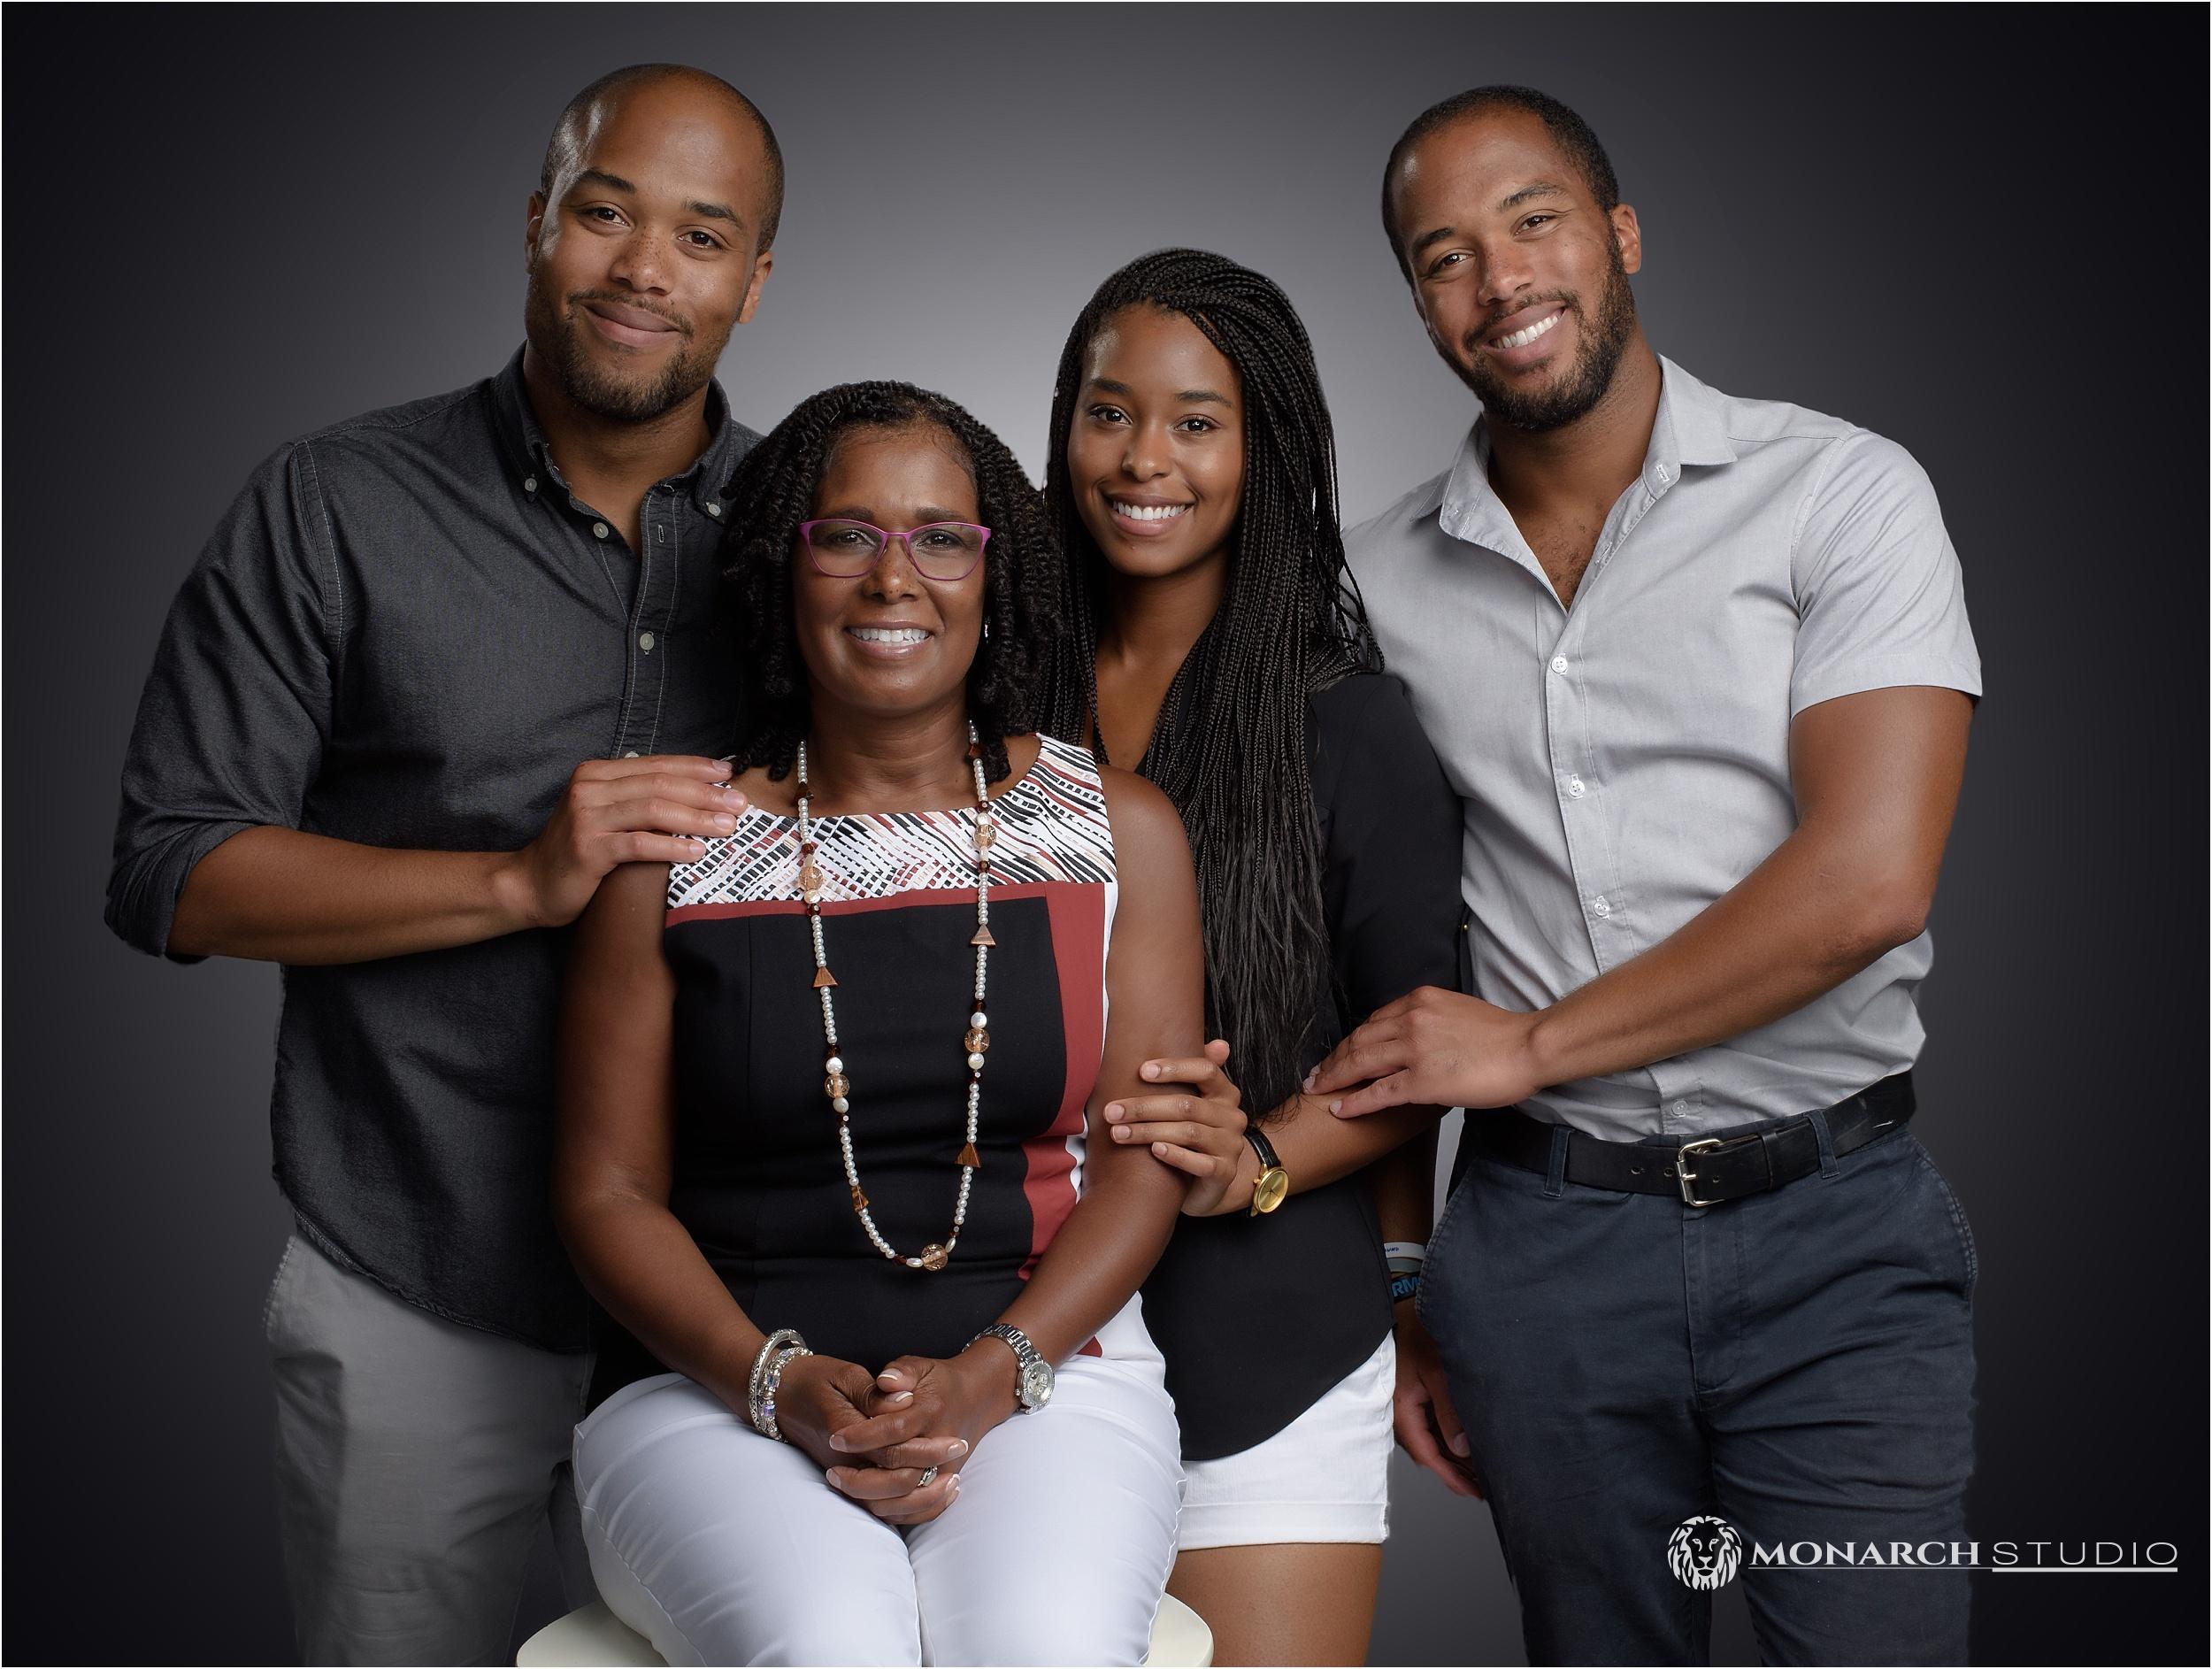 st-augustine-photographer-family-reunion-portrait-006.jpg